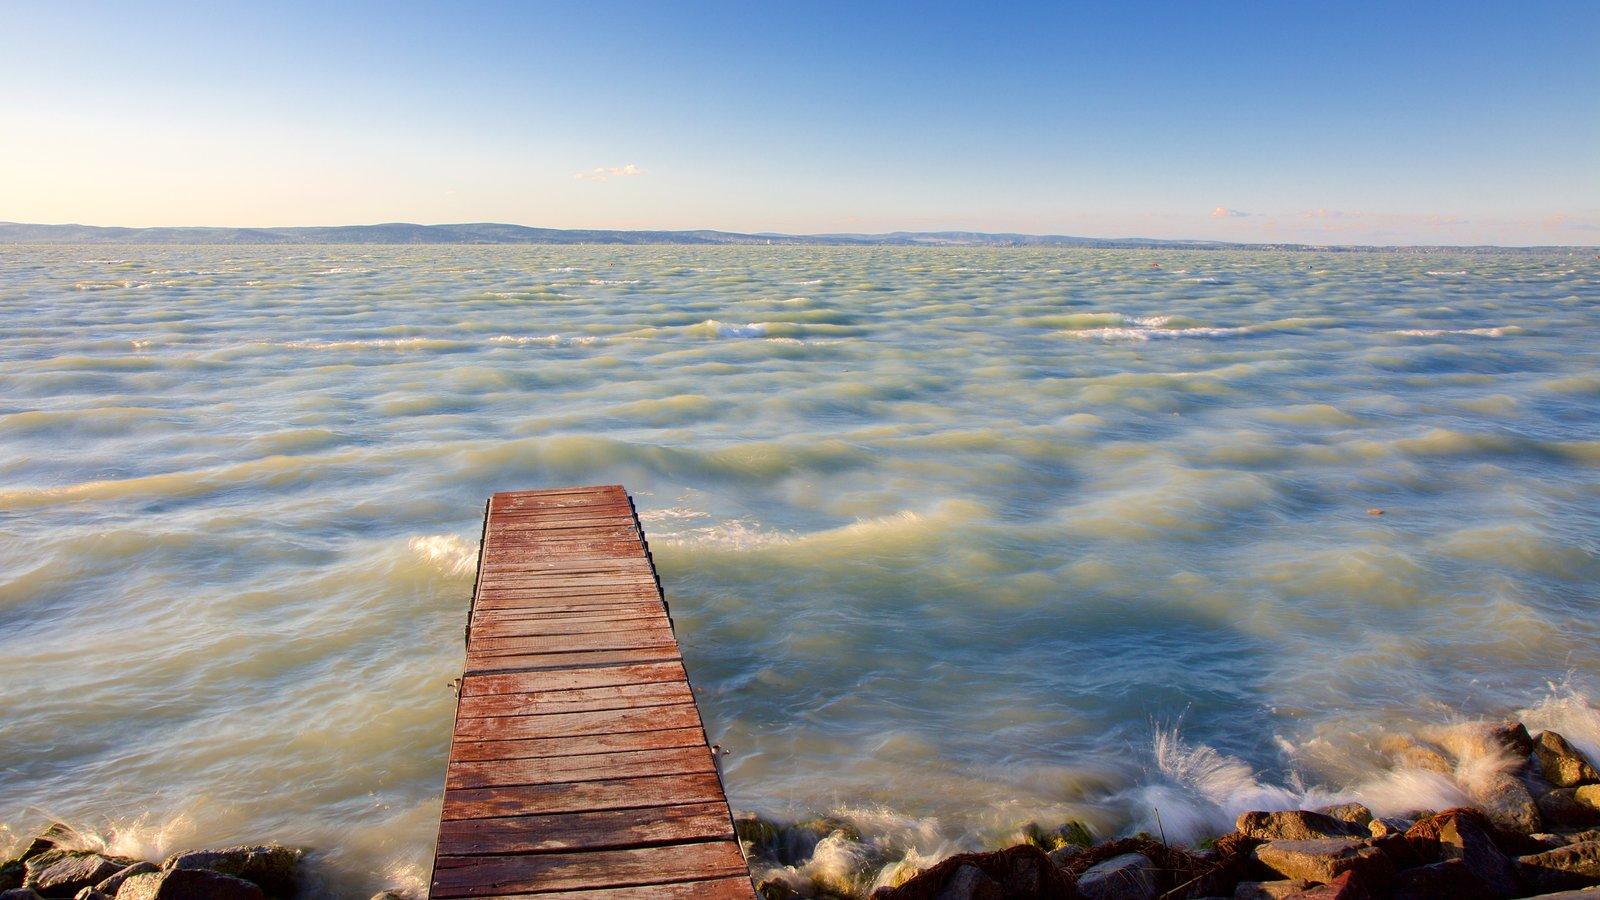 Fotos De Lago Balat 243 N Ver Fotos E Im 225 Genes De Lago Balat 243 N